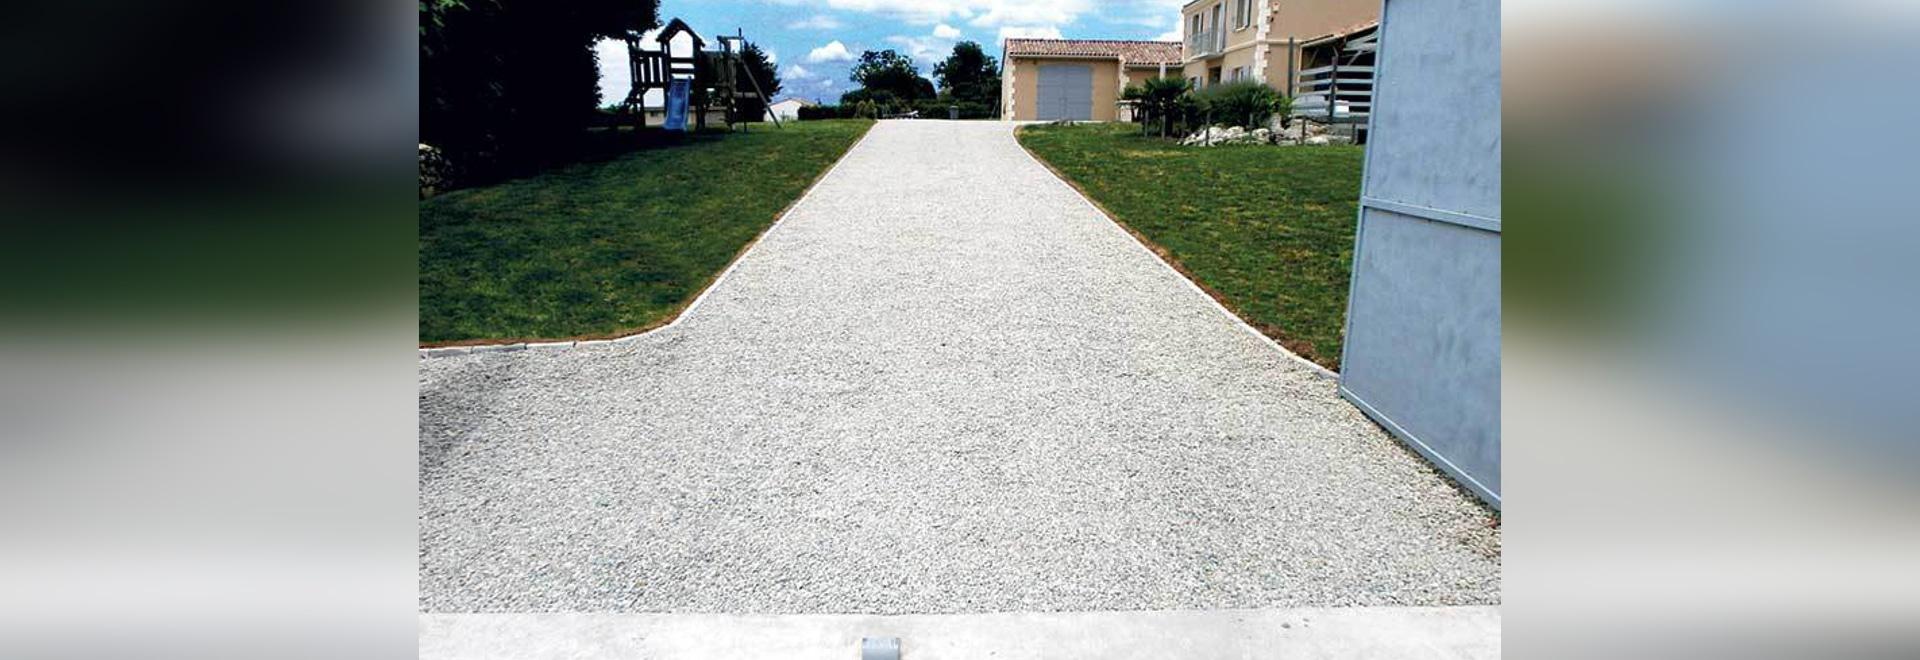 gravel path with nidagravel